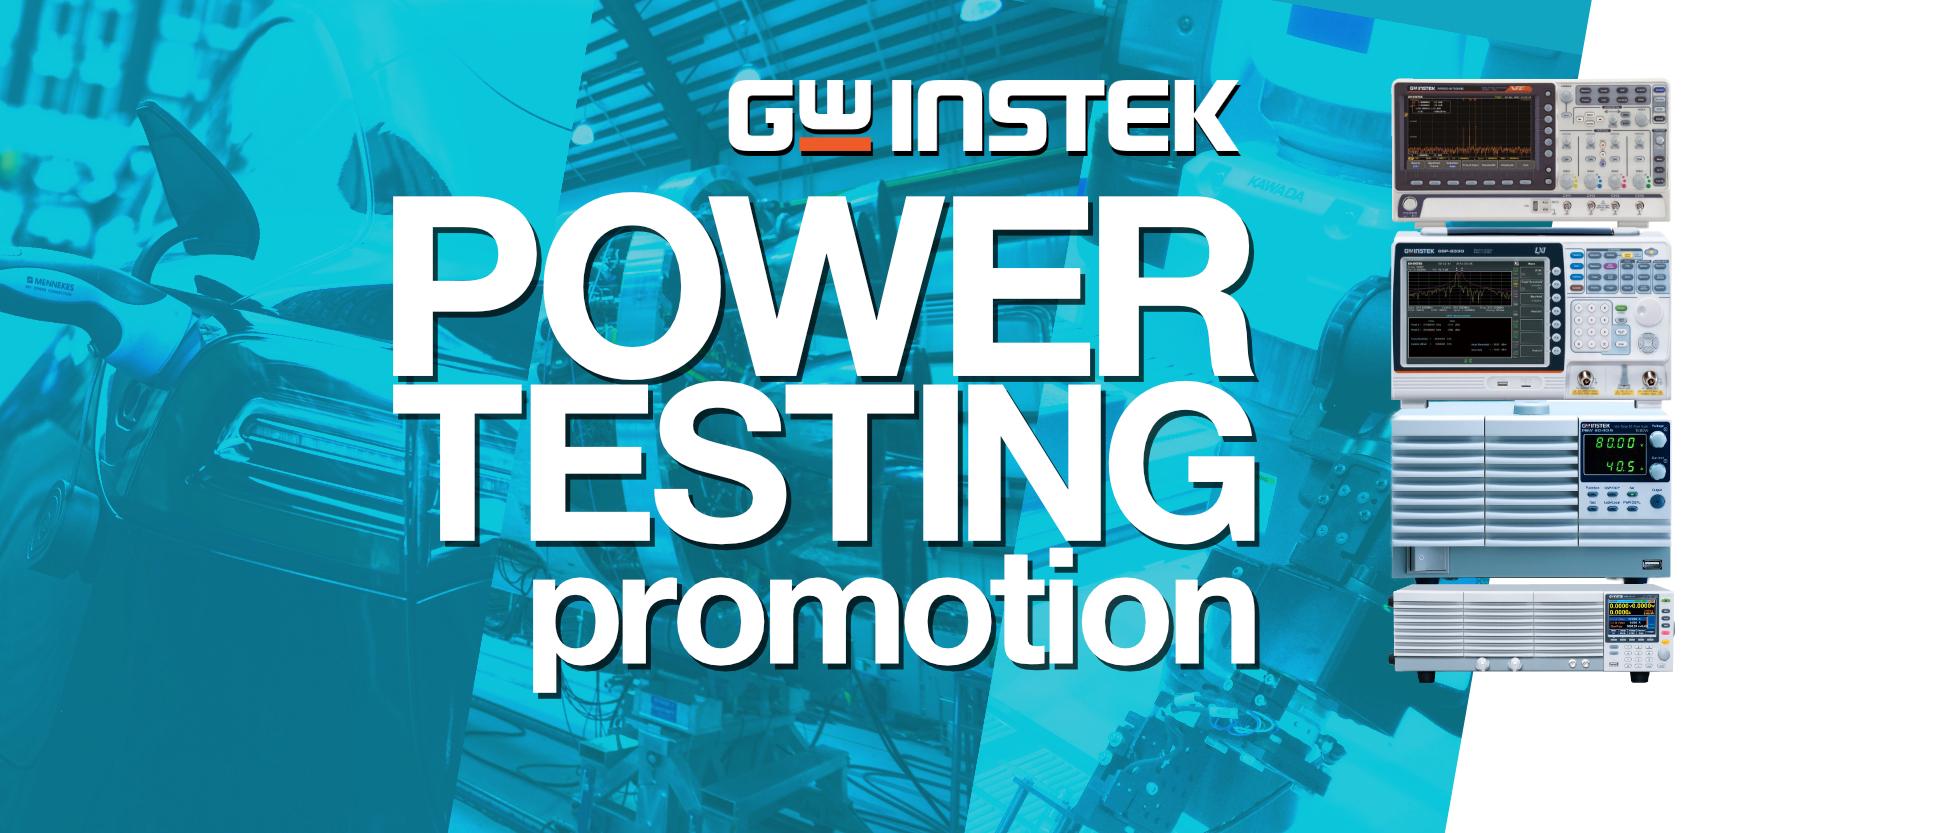 GW Instek Power Testing Promotion